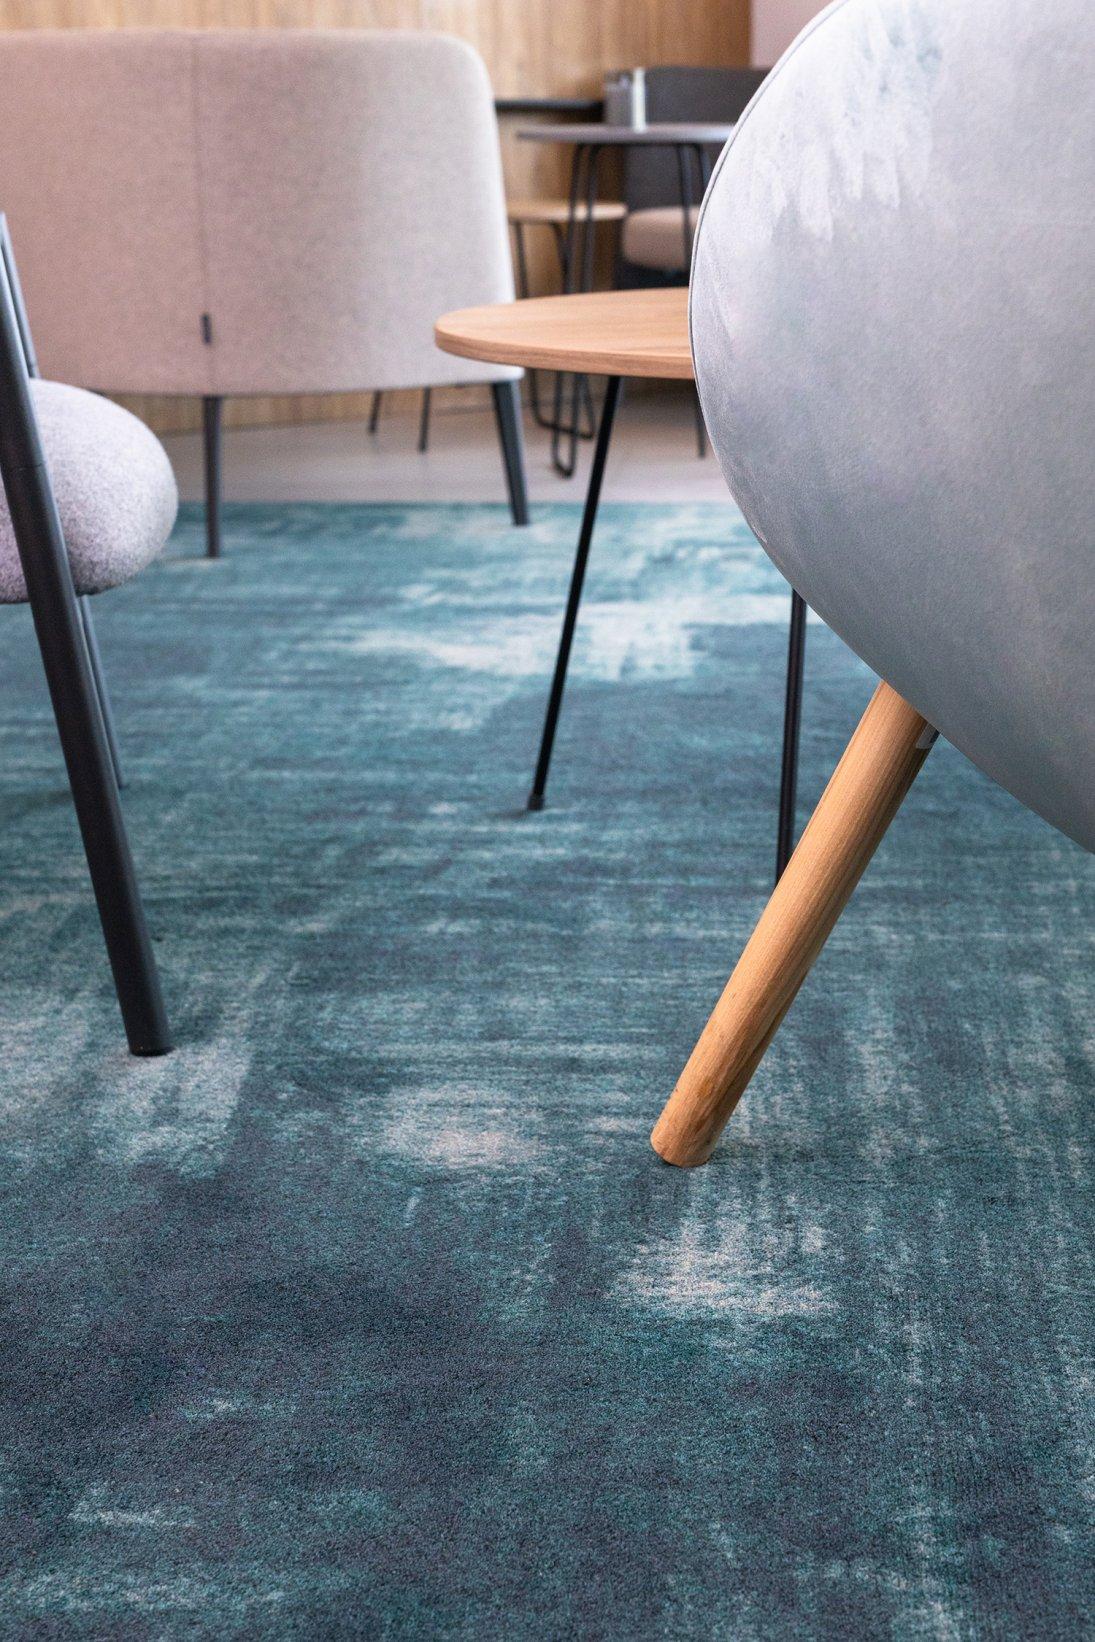 20200625-carpet-and-more-hilton-otopeni-39